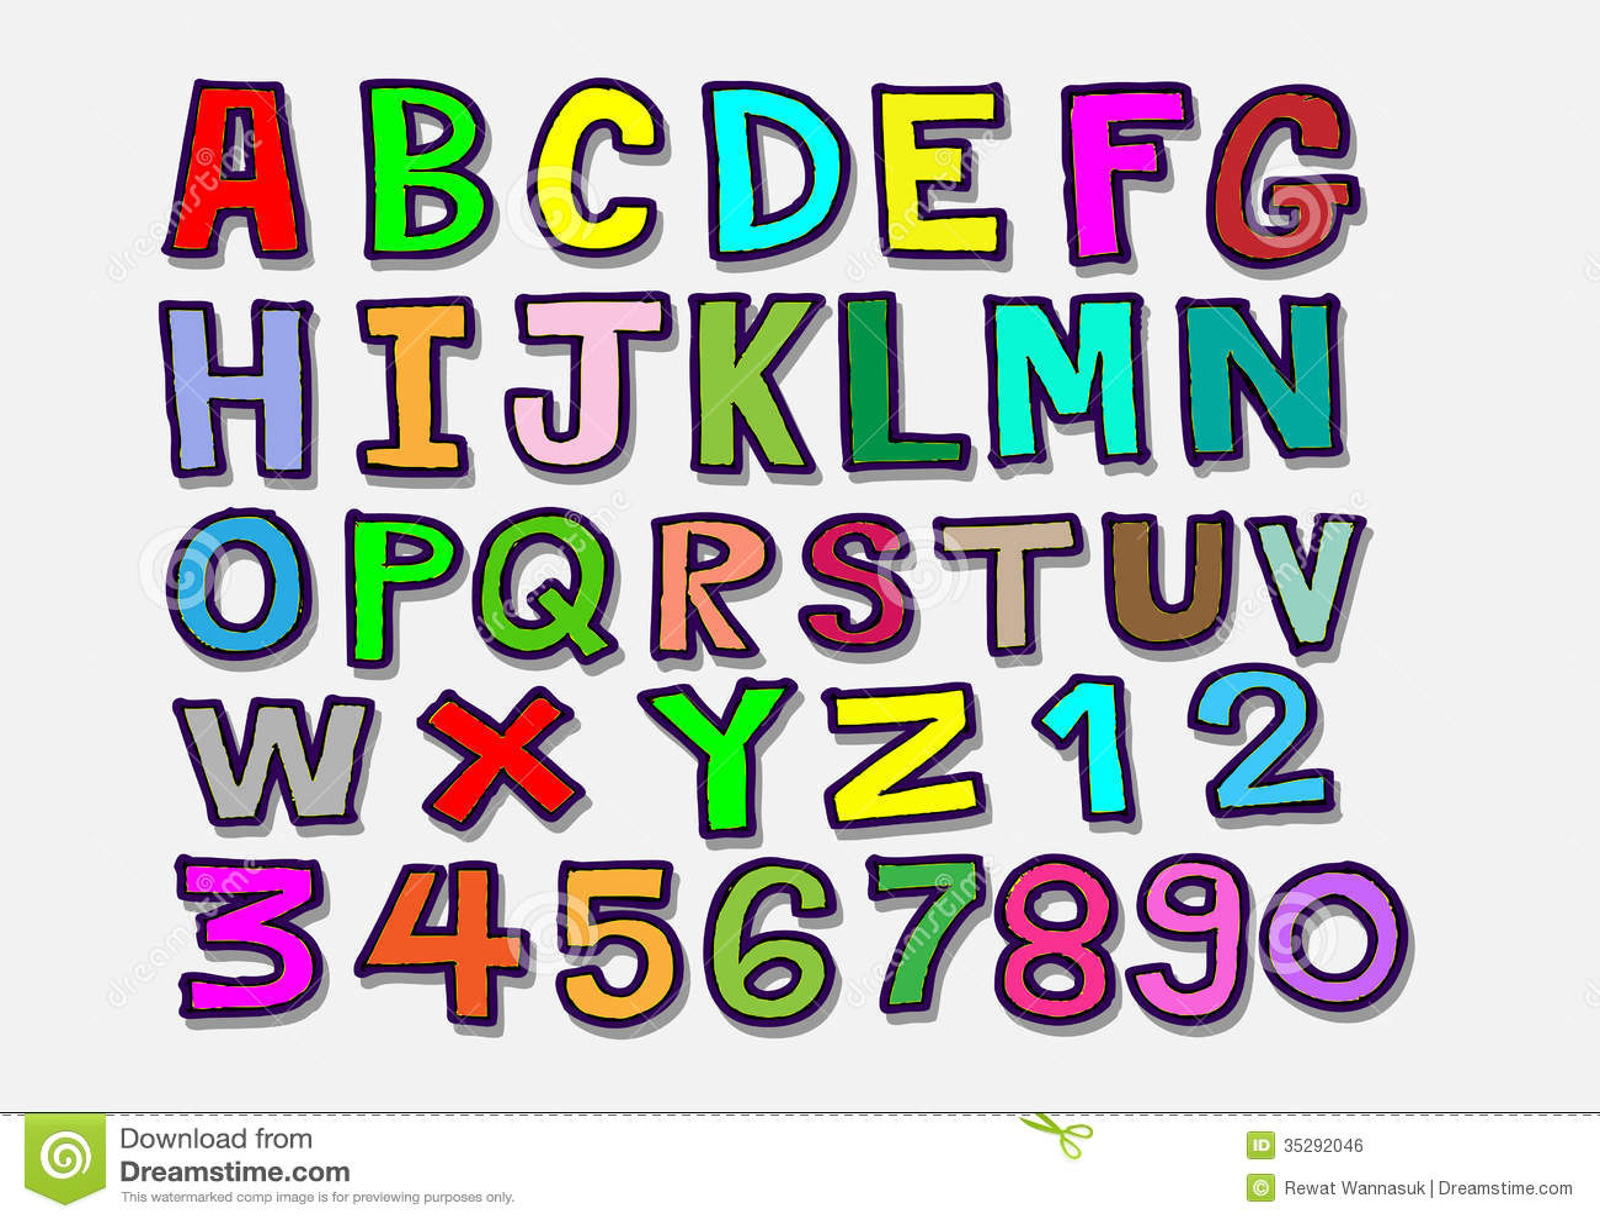 Handwritten Font Stock Vector. Illustration Of Capital - 38949957